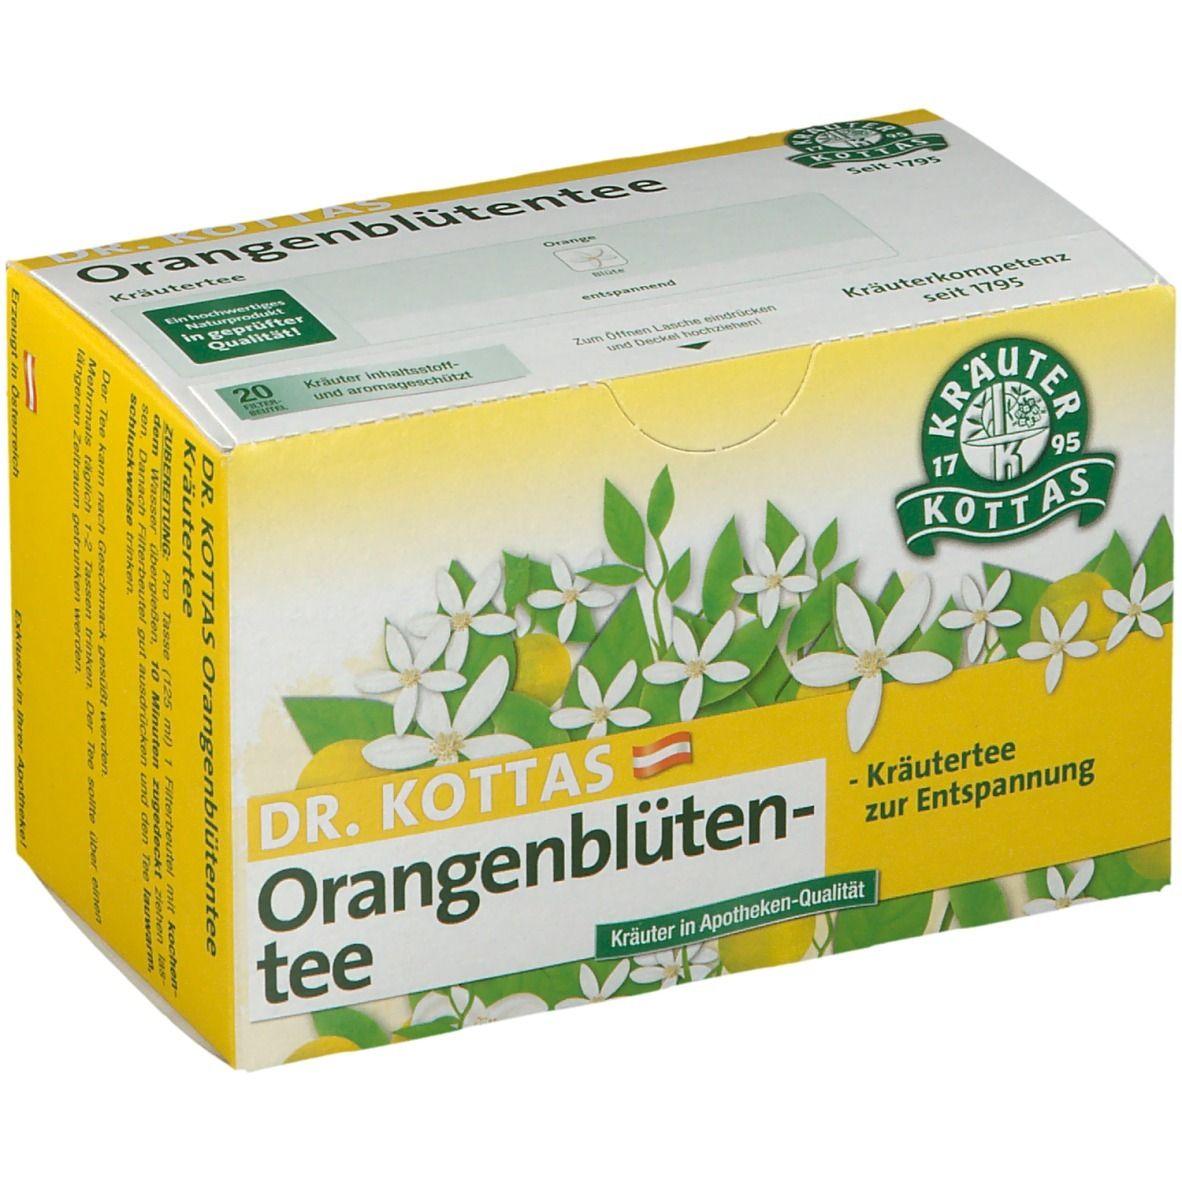 Dr. Kottas Orangenblütentee Filterbeutel